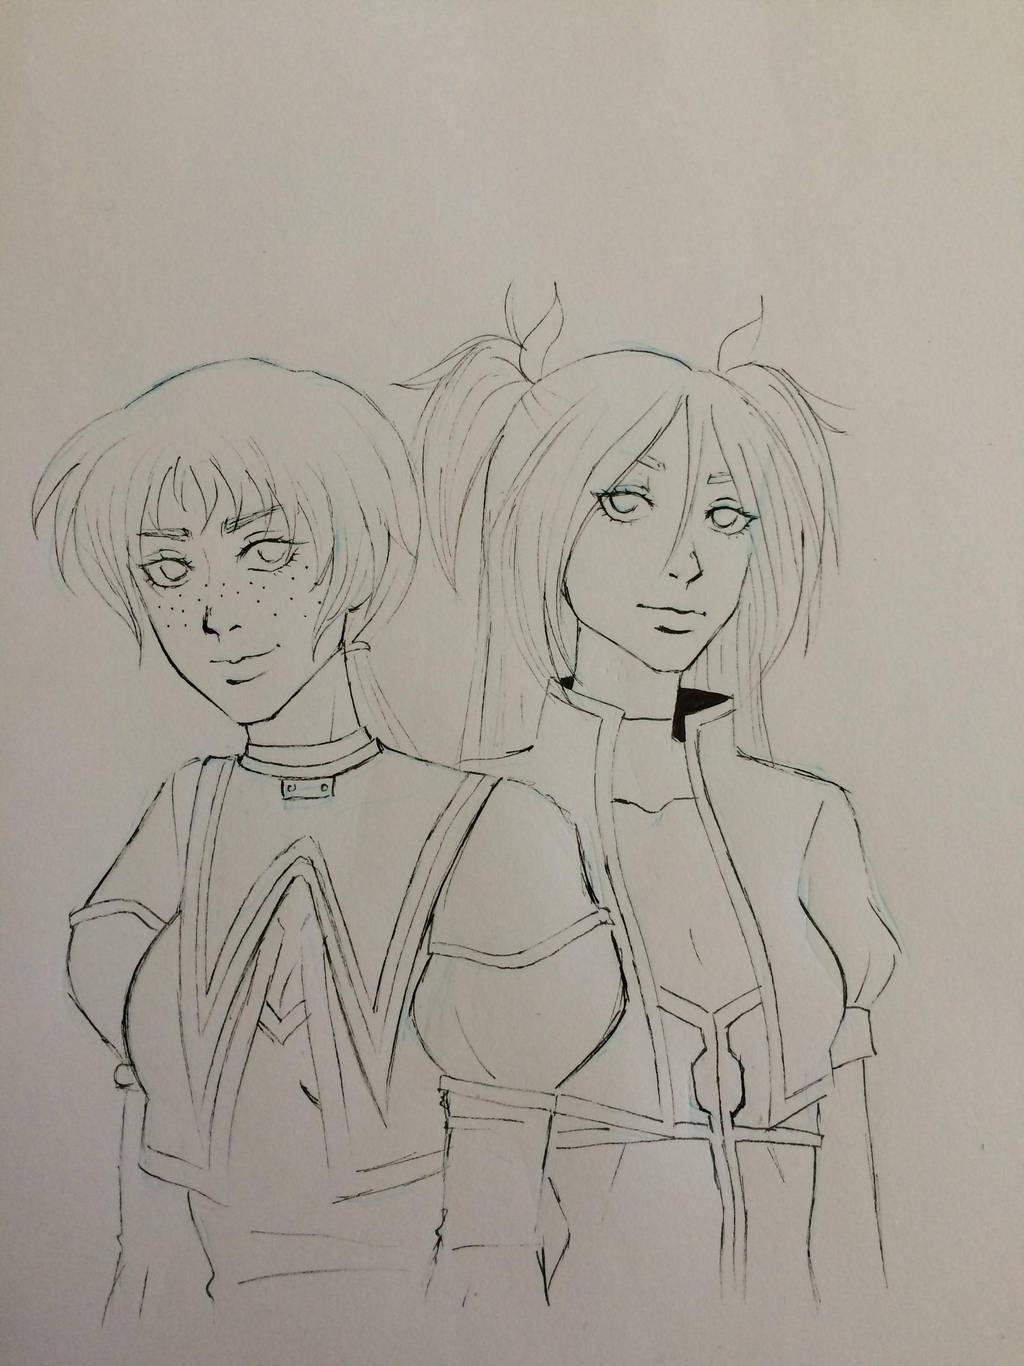 Shin and Ken by Yasm1806